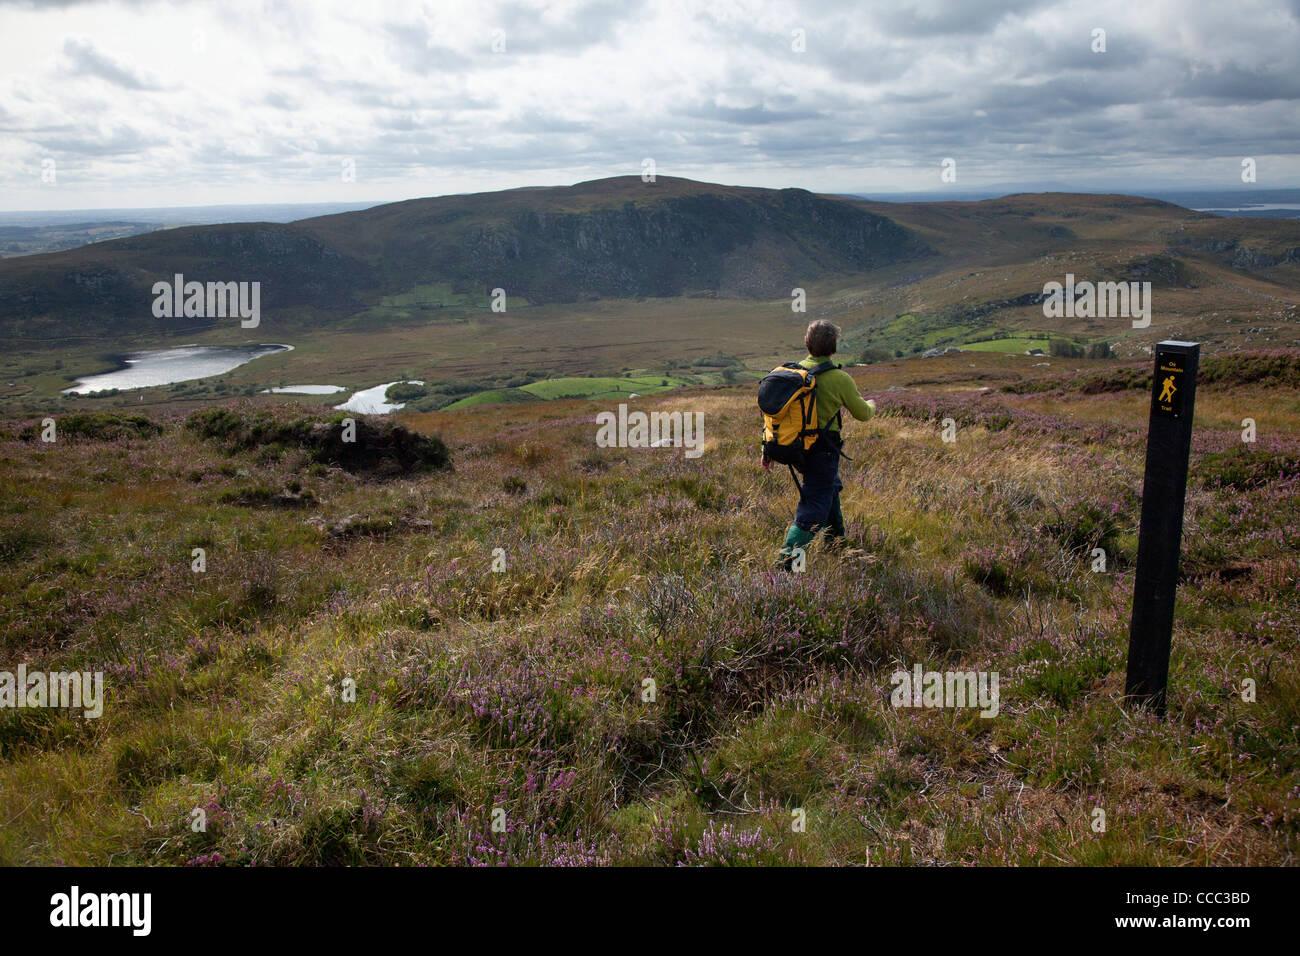 Walker on the Ox Mountain Trail above Glendaduff, County Mayo, Ireland. - Stock Image